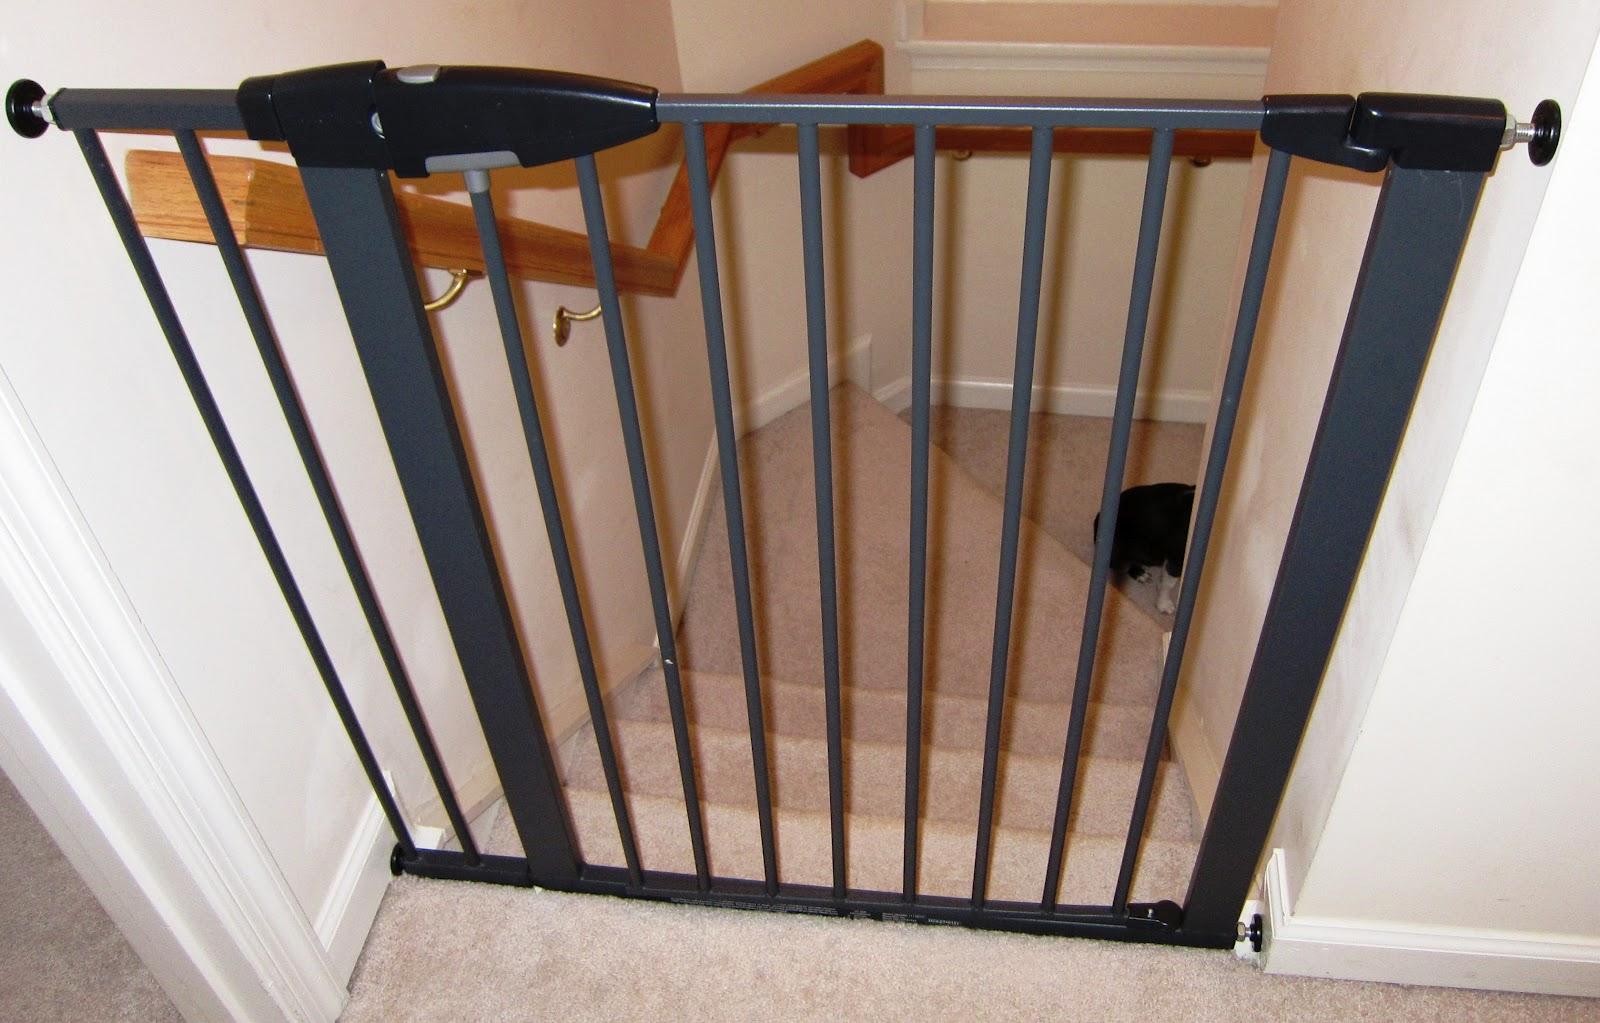 Munchkin Baby Gate Home Wall